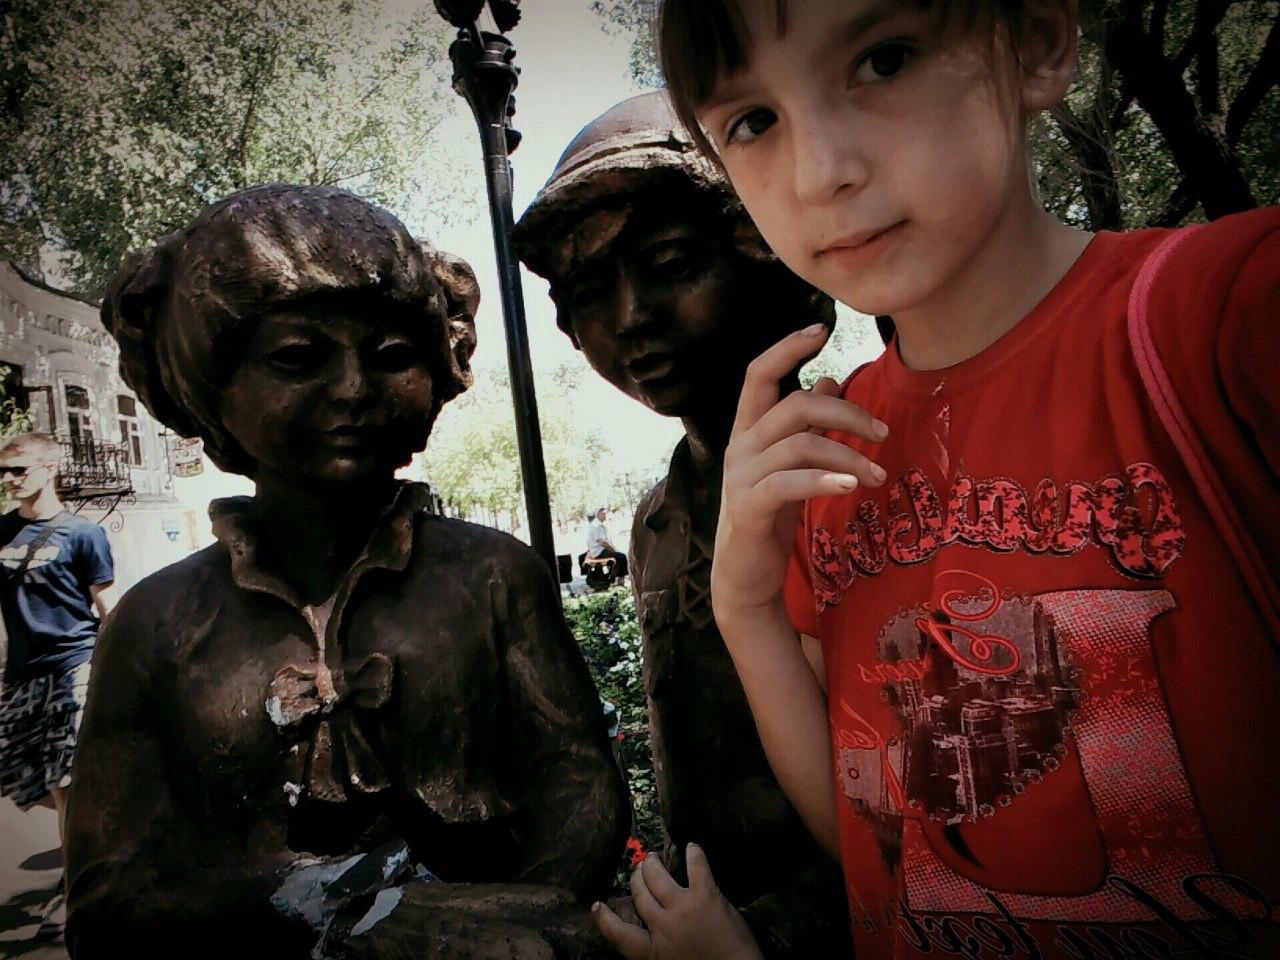 Элла Бушева, 11 лет